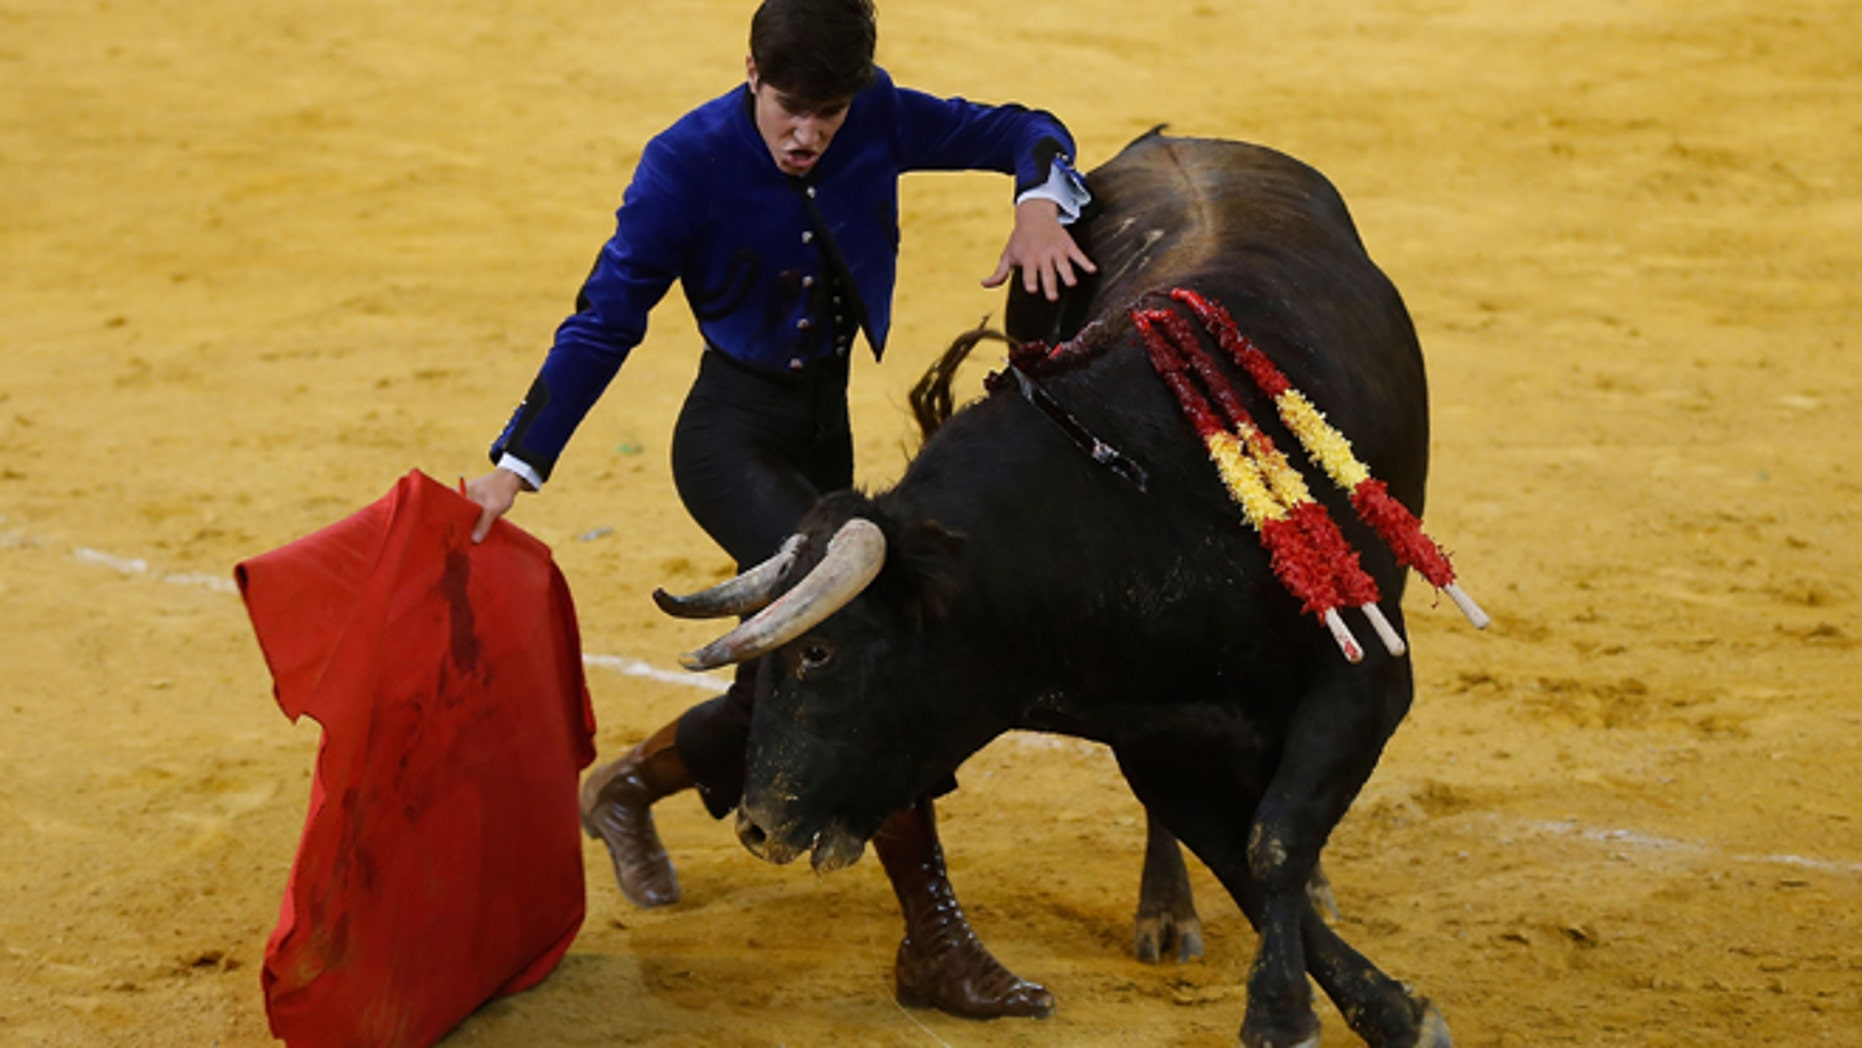 MADRID, SPAIN - MARCH 22:  Spanish bullfighter Alvaro Lorenzo performs during the Bullfighting Charity Festival in Madrid at at Palacio Vistalegre Arena bullring on March 22, 2014 in Madrid, Spain.  (Photo by Gonzalo Arroyo Moreno/Getty Images)